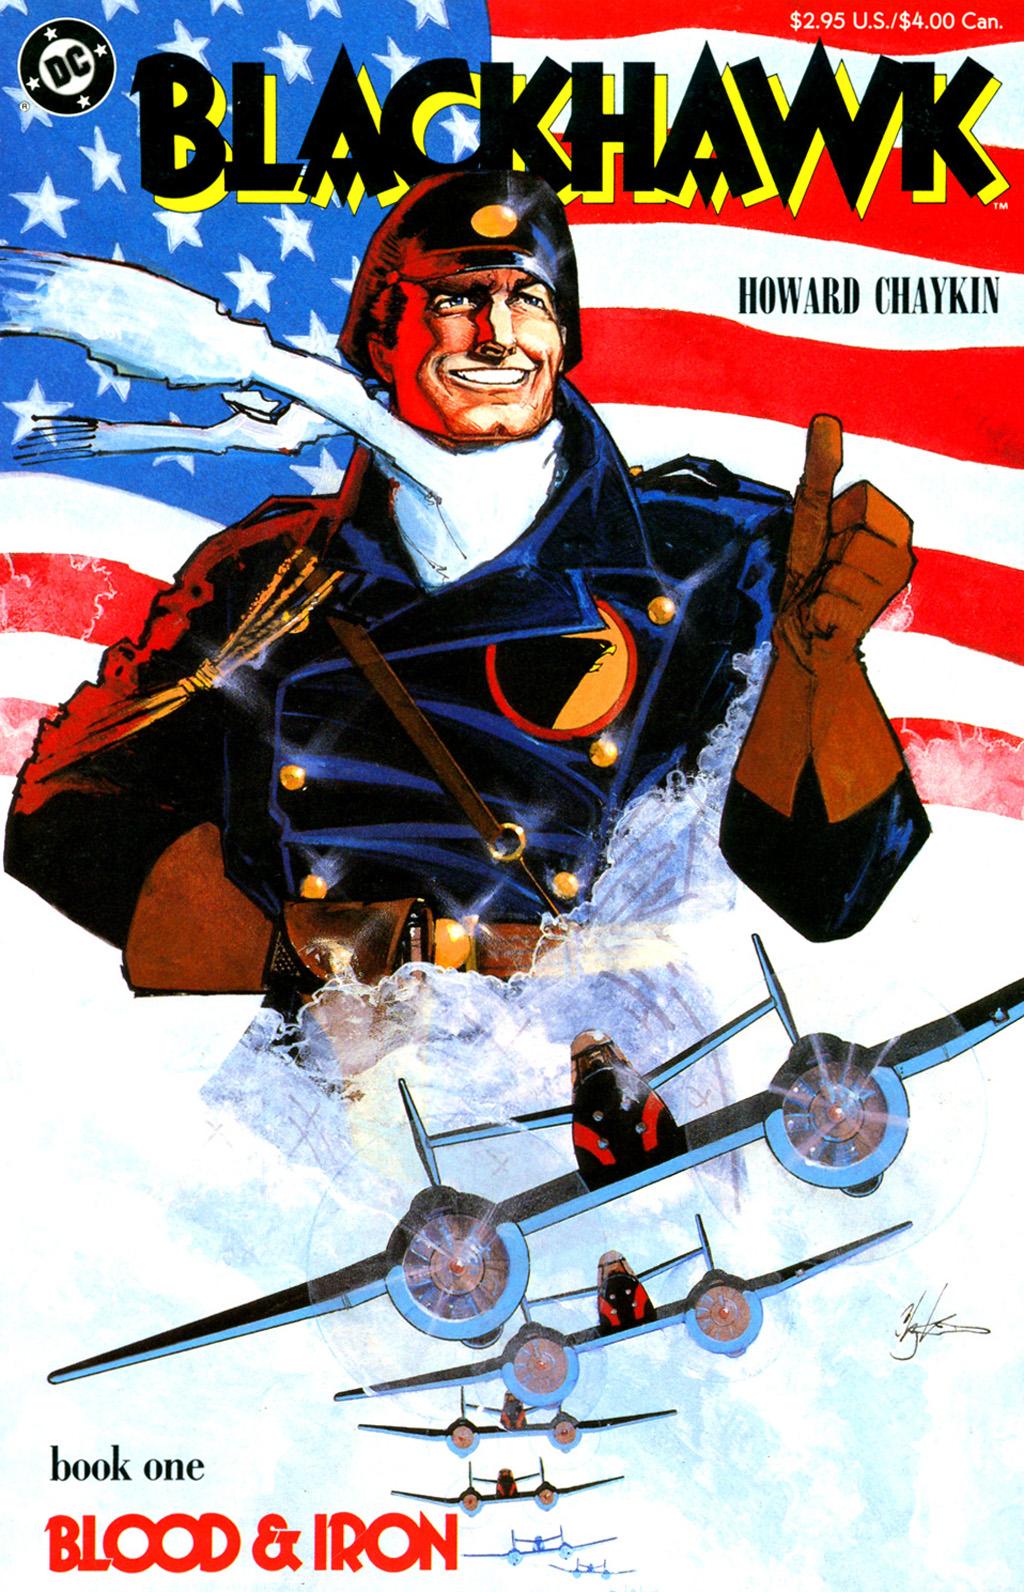 Blackhawk (1988) issue 1 - Page 1